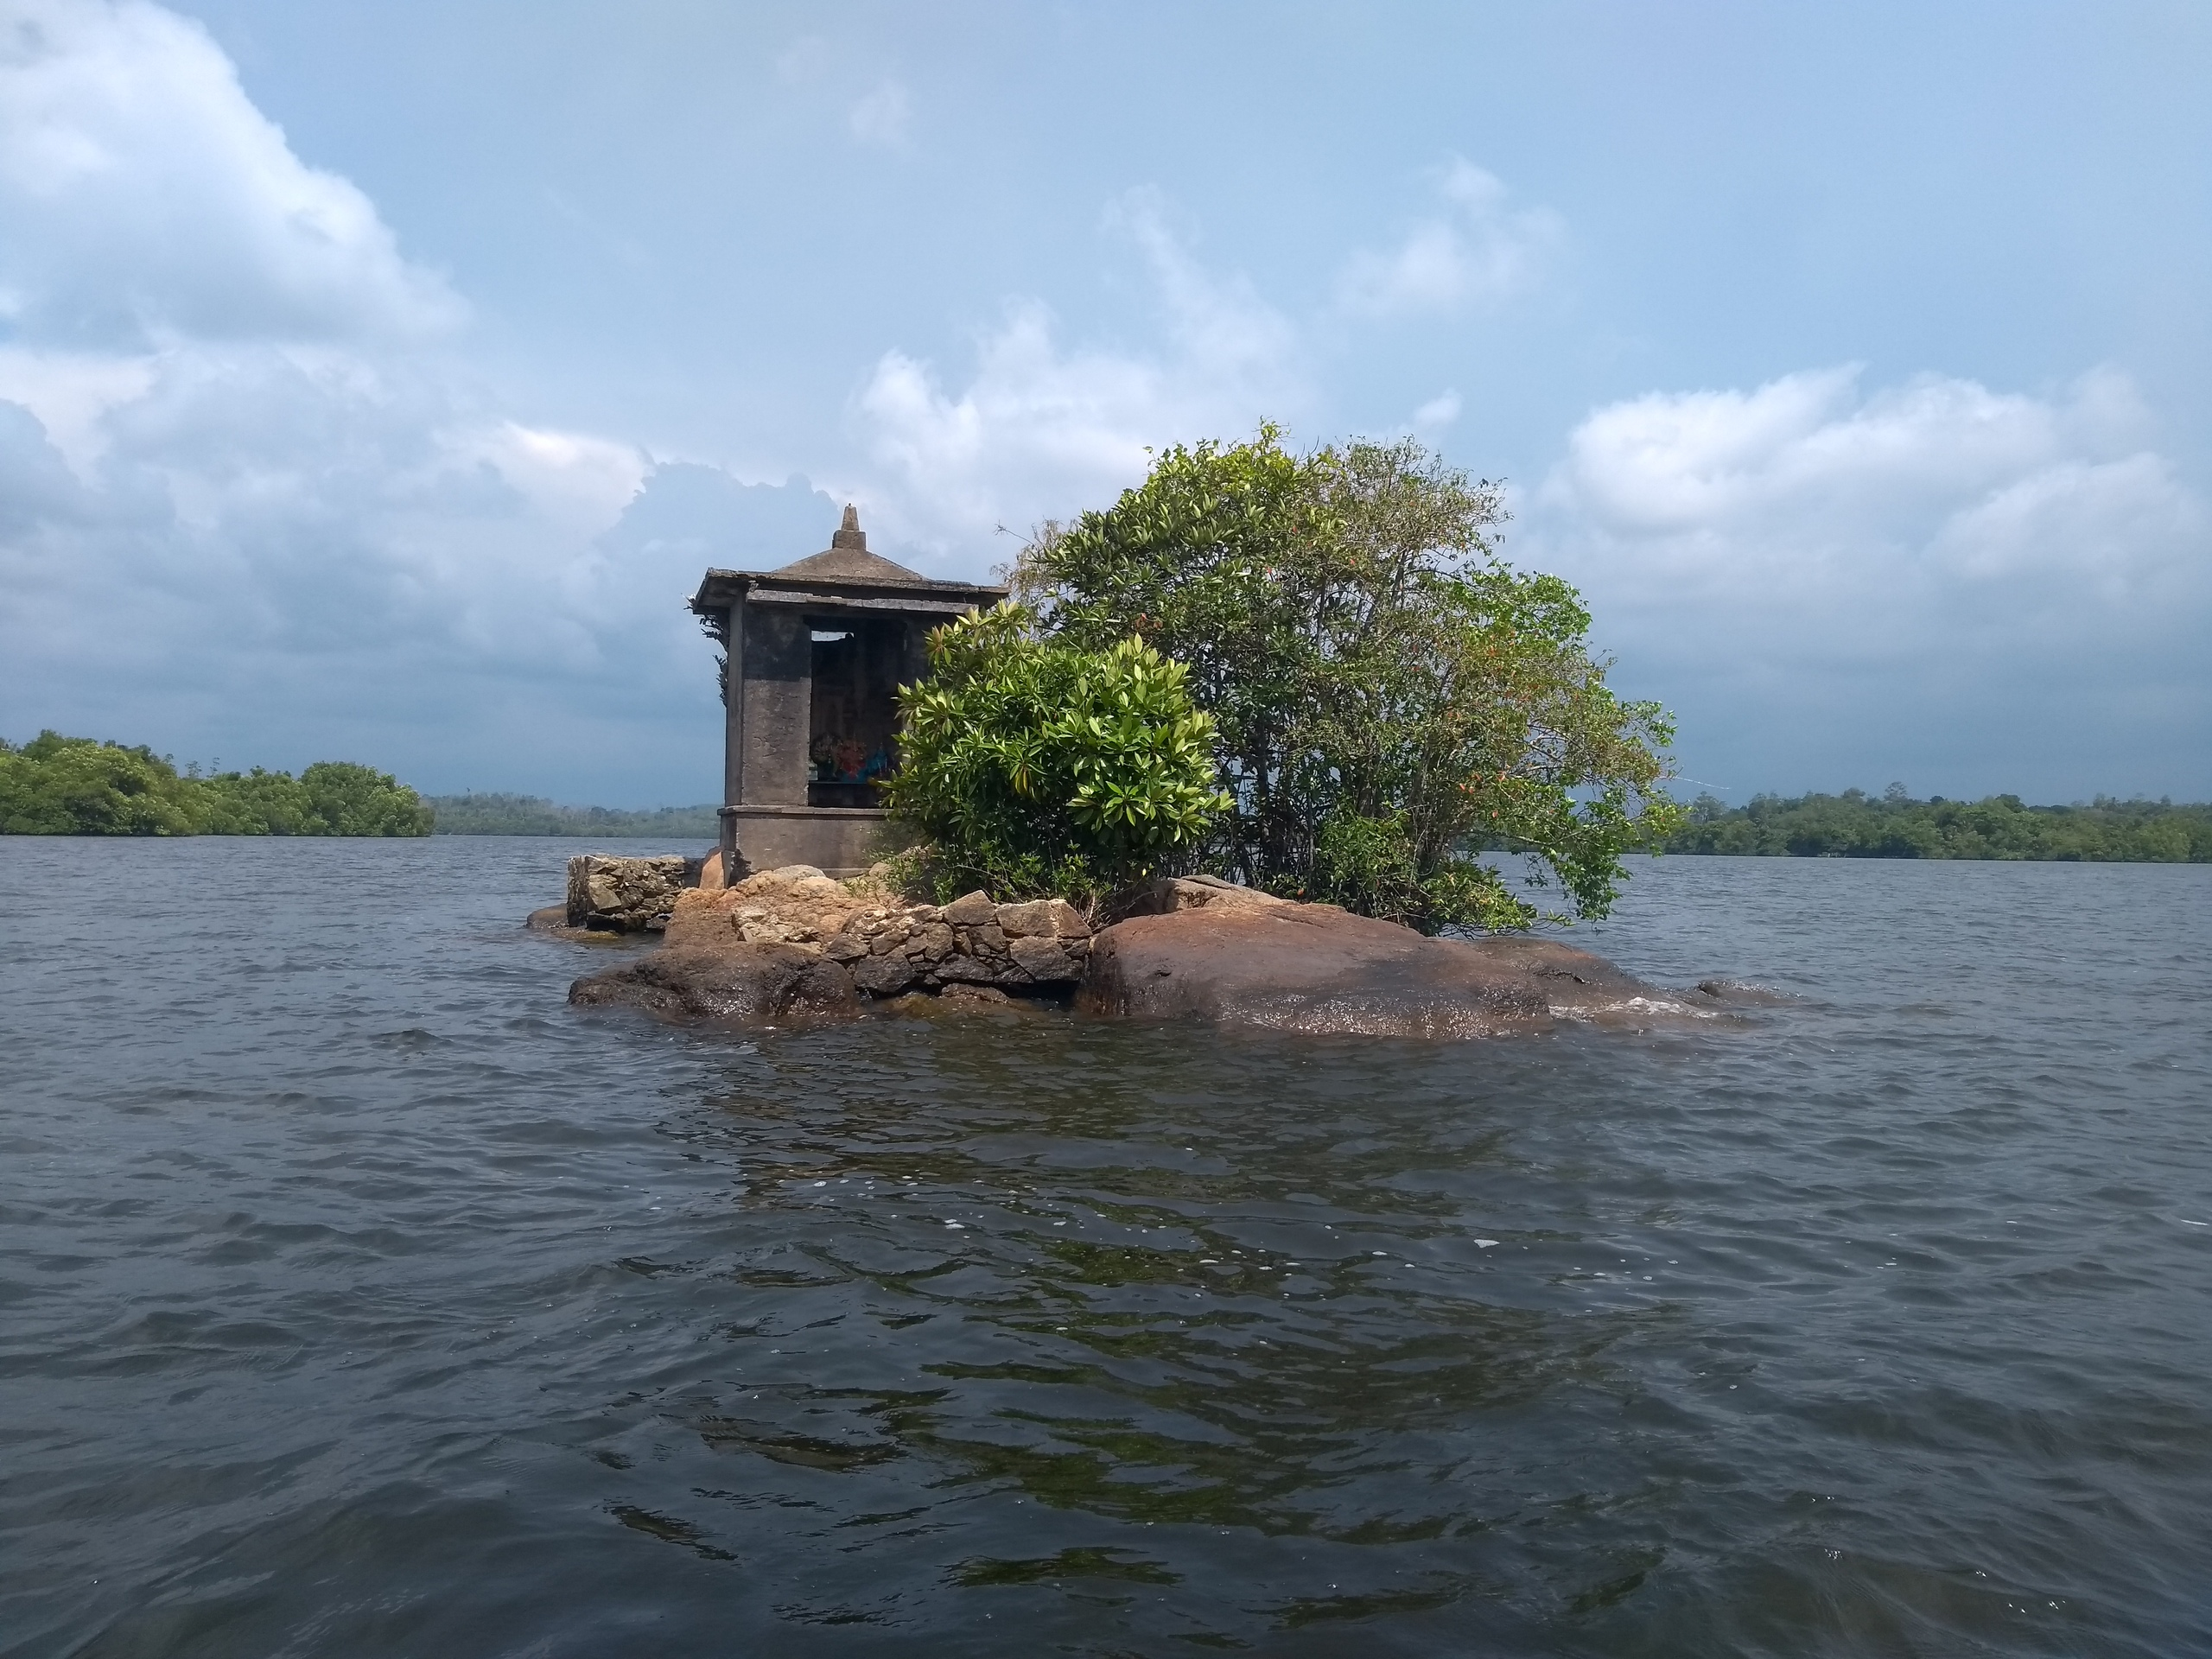 Шри Ланка (фото) - Страница 11 AxLLwN6-tZo